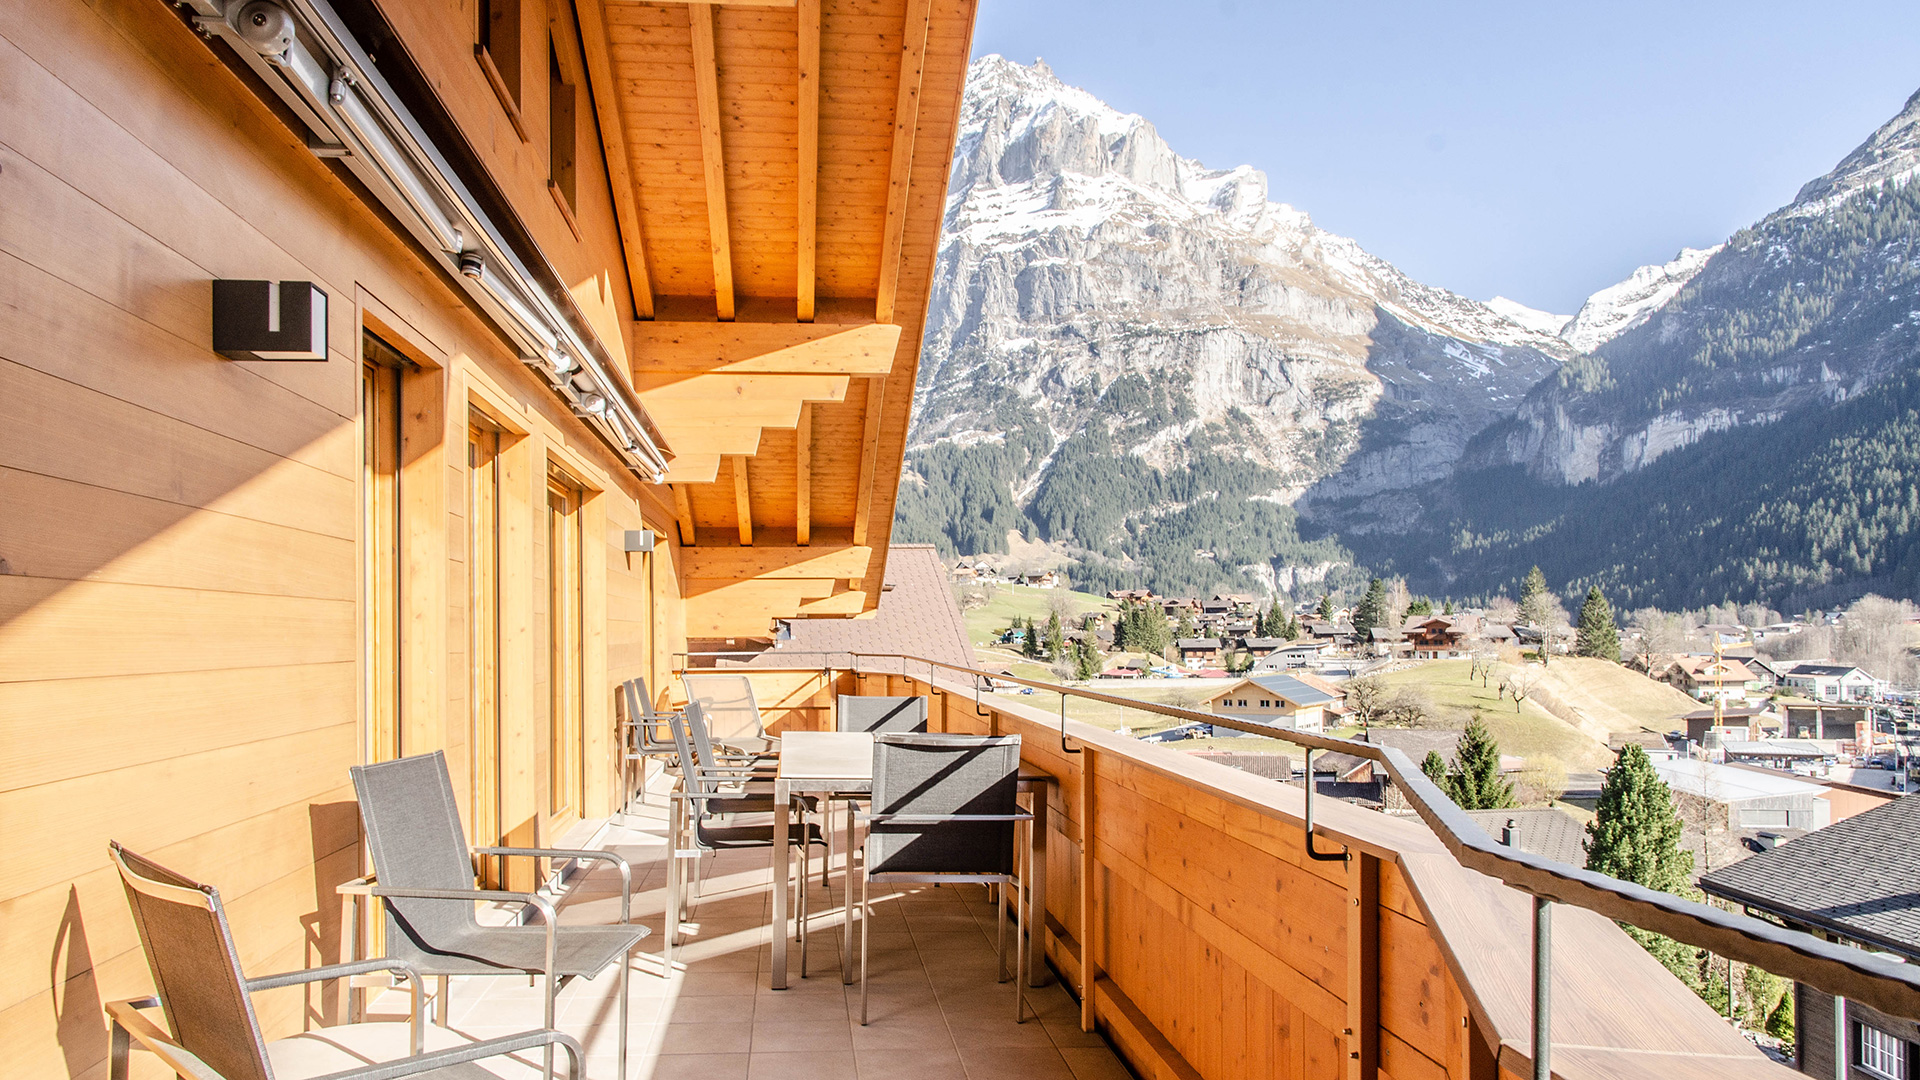 Antara Apartments, Switzerland